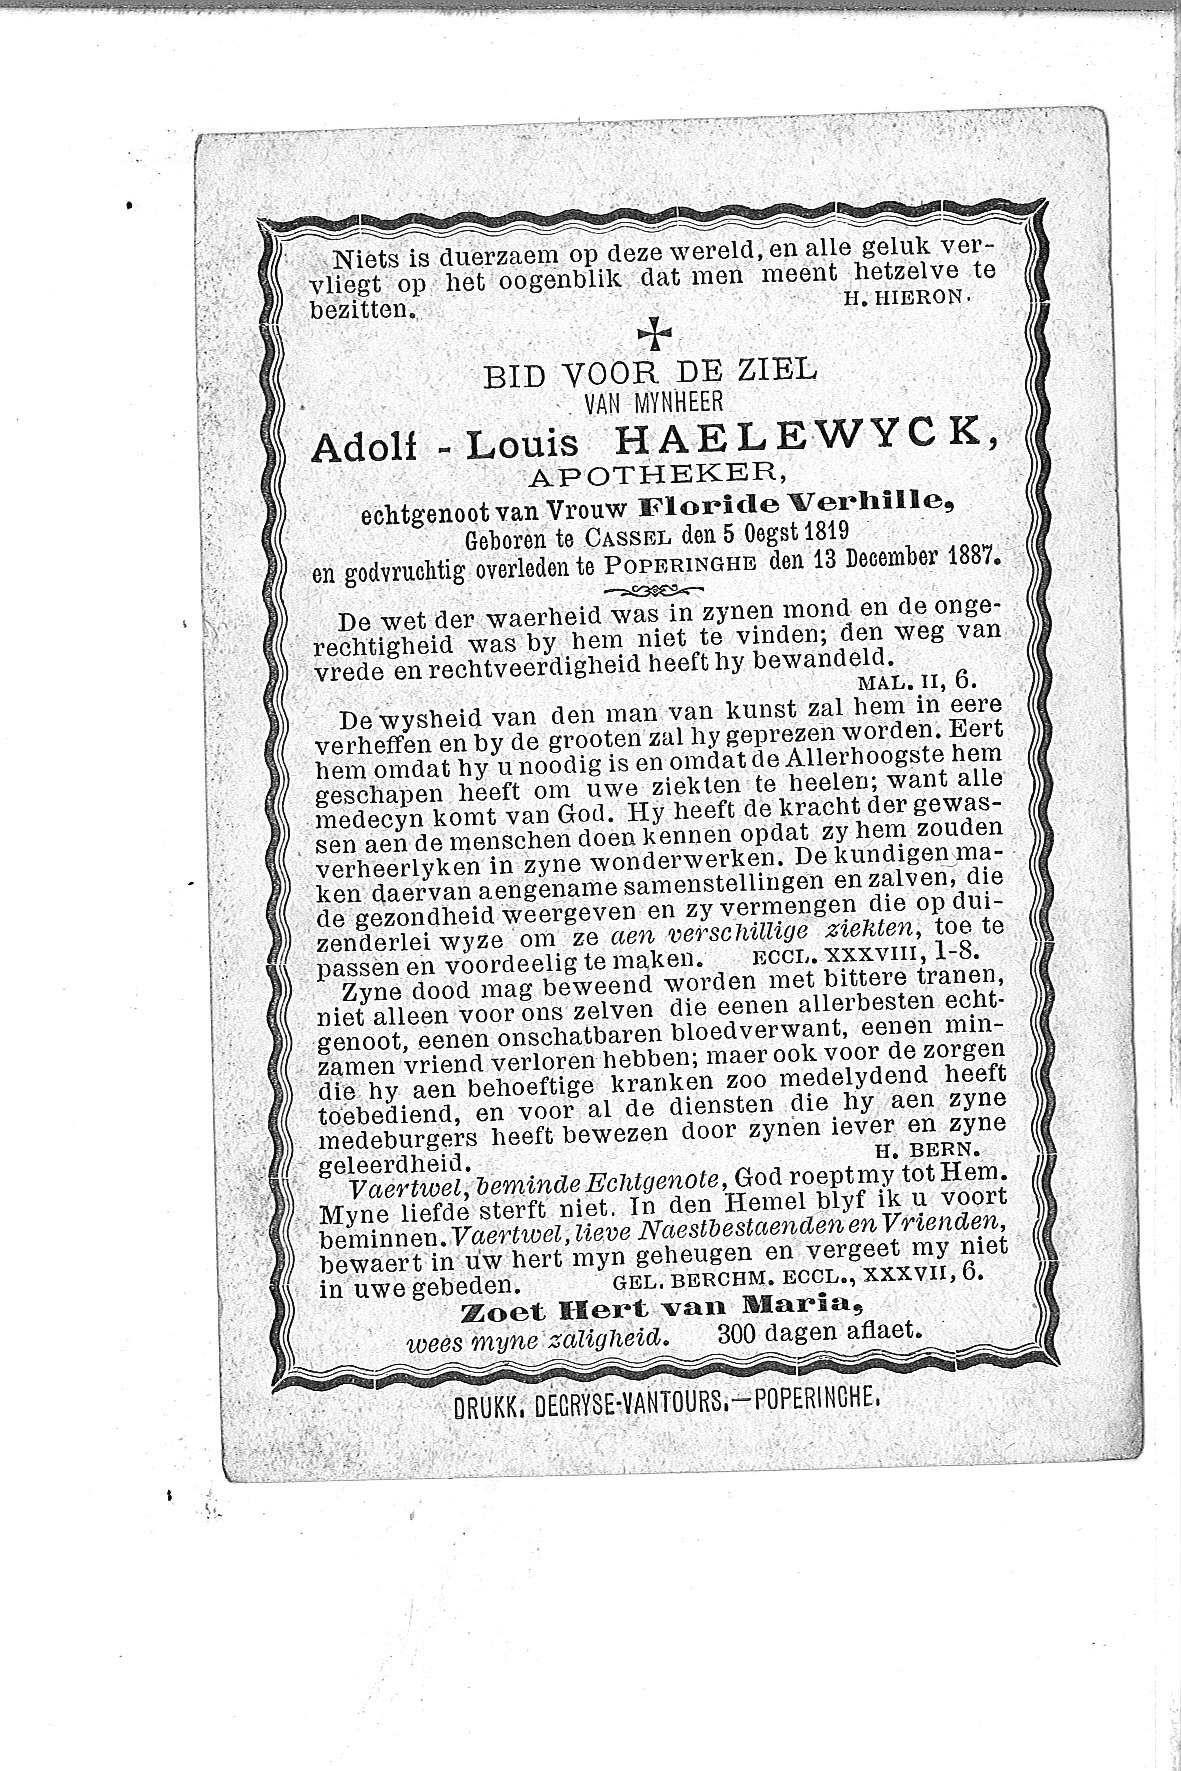 Adolf-Louis-(1887)-20121011095319_00002.jpg